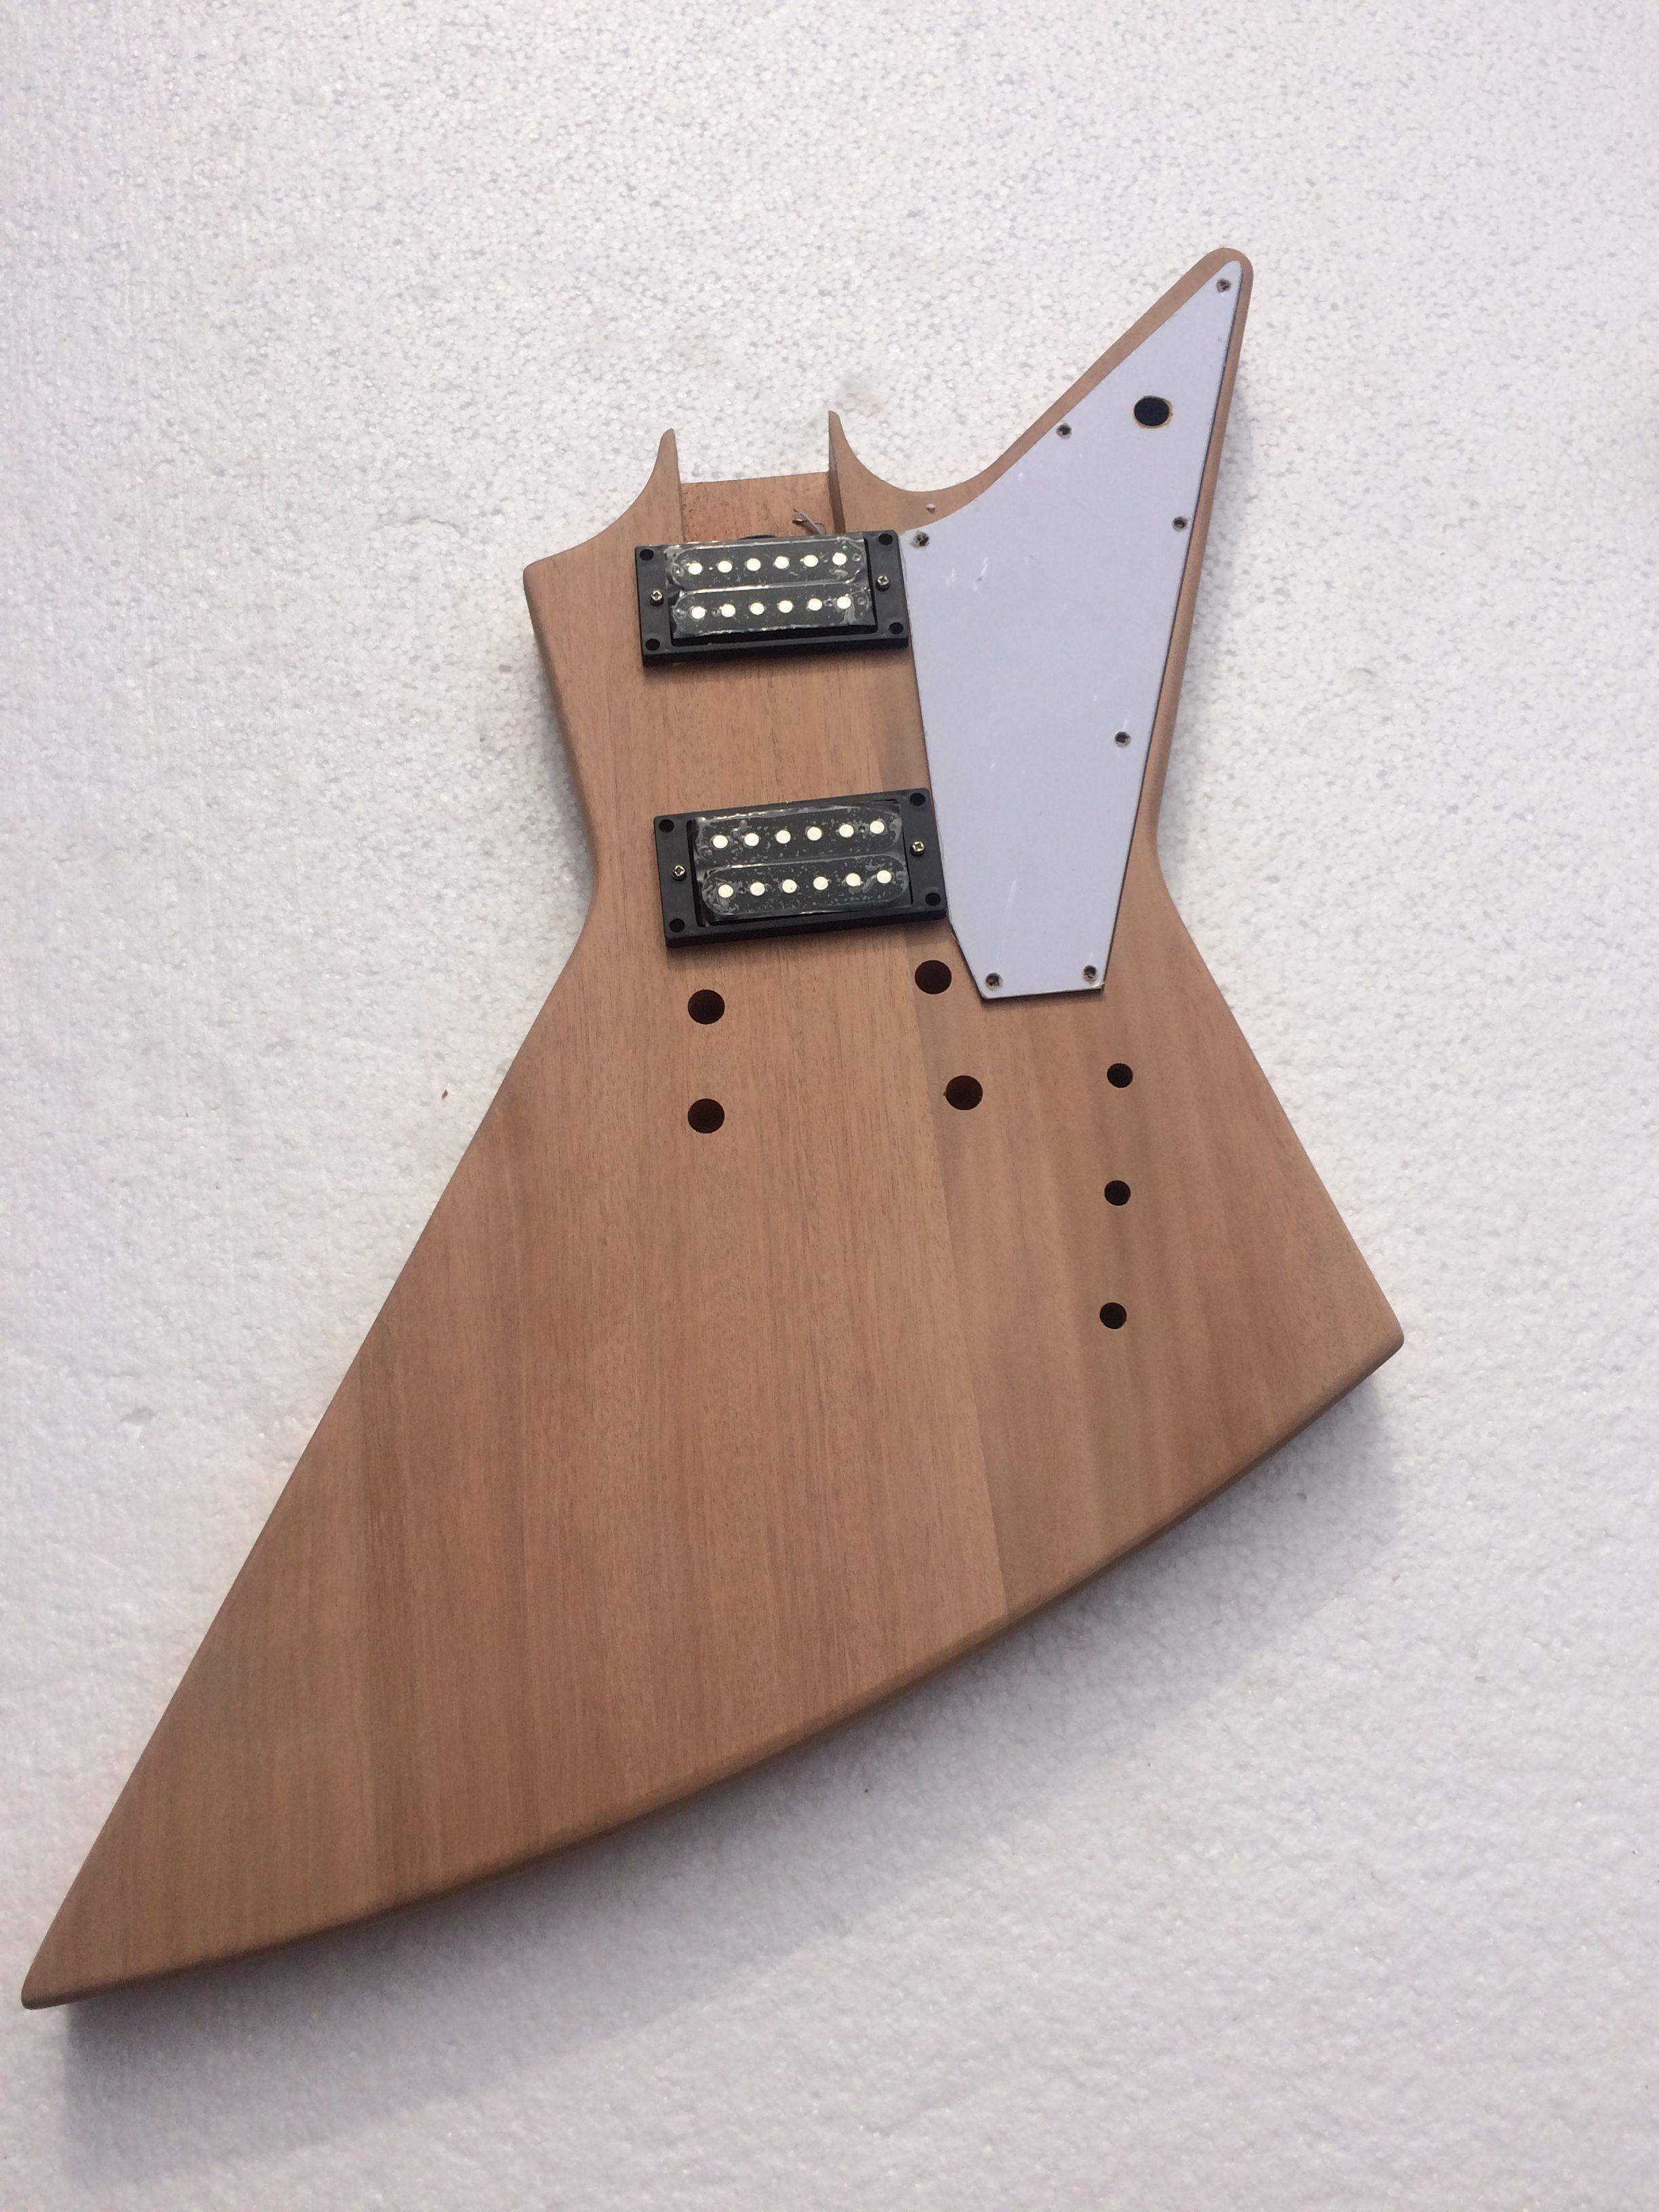 diy guitar kits electric acoustic guitar best acoustic electric guitars from zhong9891. Black Bedroom Furniture Sets. Home Design Ideas